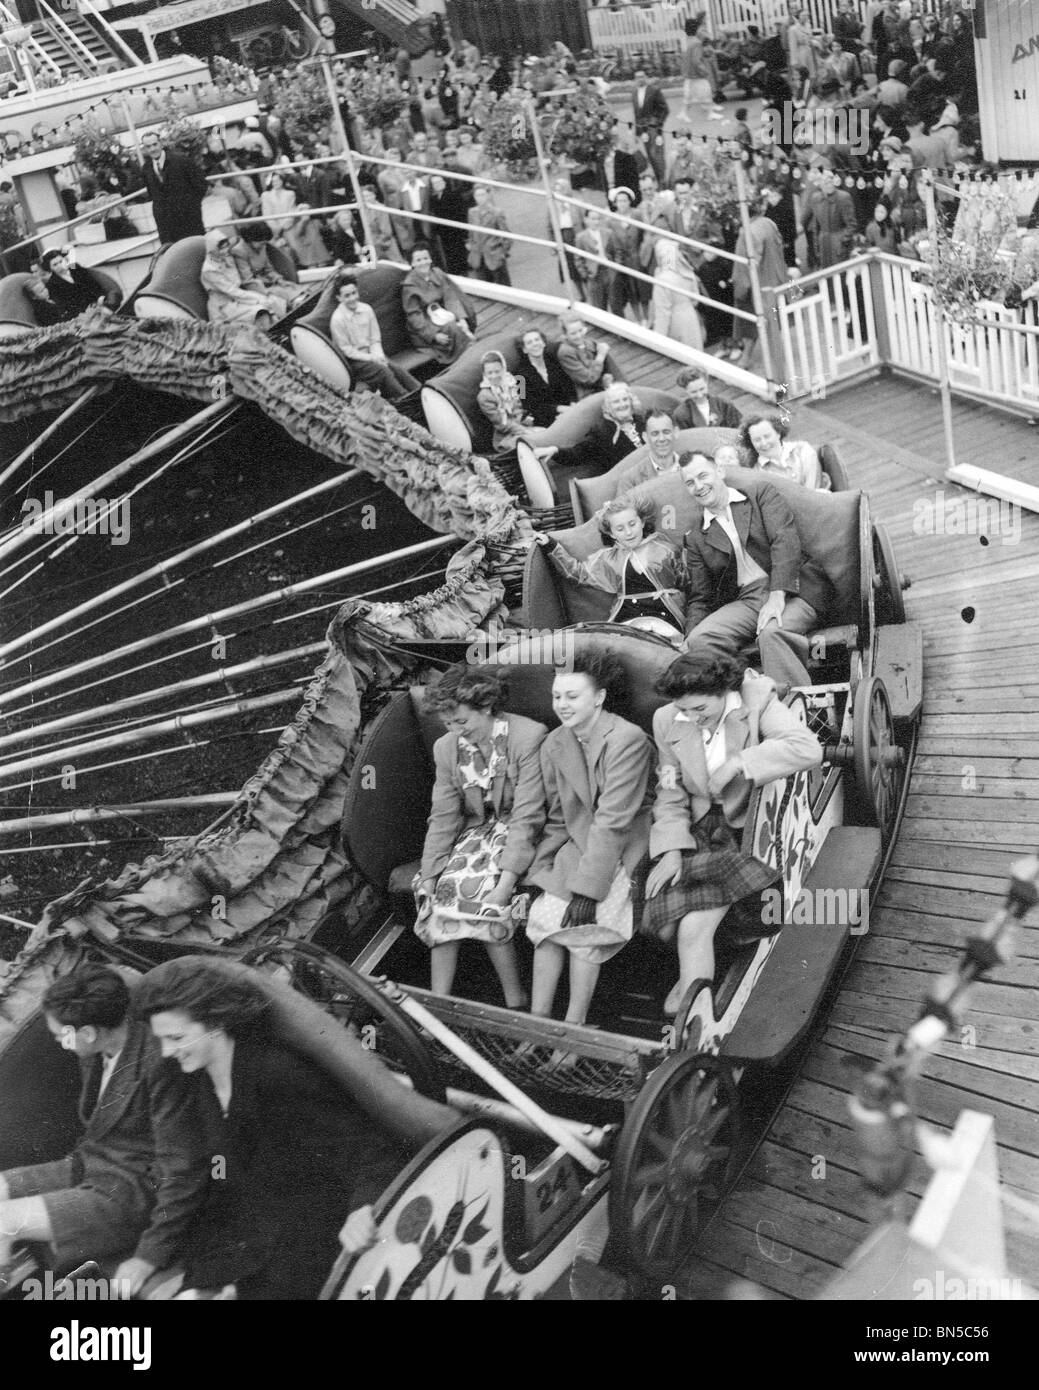 MARGATE FUNFAIR in 1951 - Stock Image